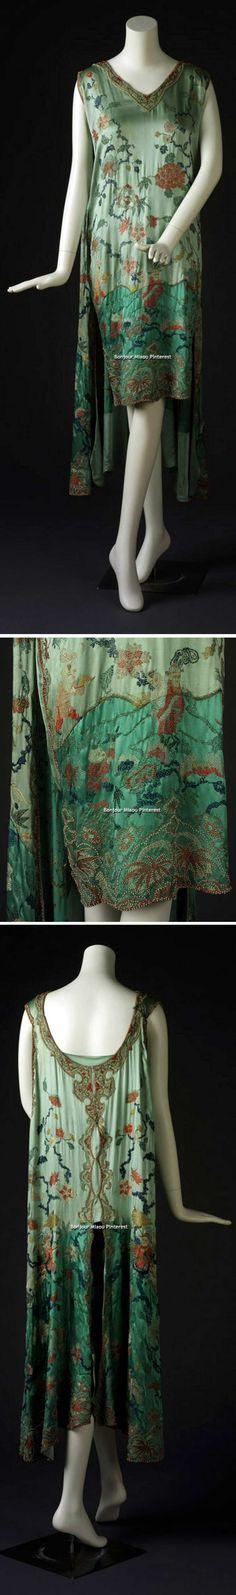 Evening dress, Eugenie et Juliette, ca. 1926-28. One-piece green satin, sleeveless dress. Embroidered back panel attached at the shoulder seam. Rhode Island School of Design Museum